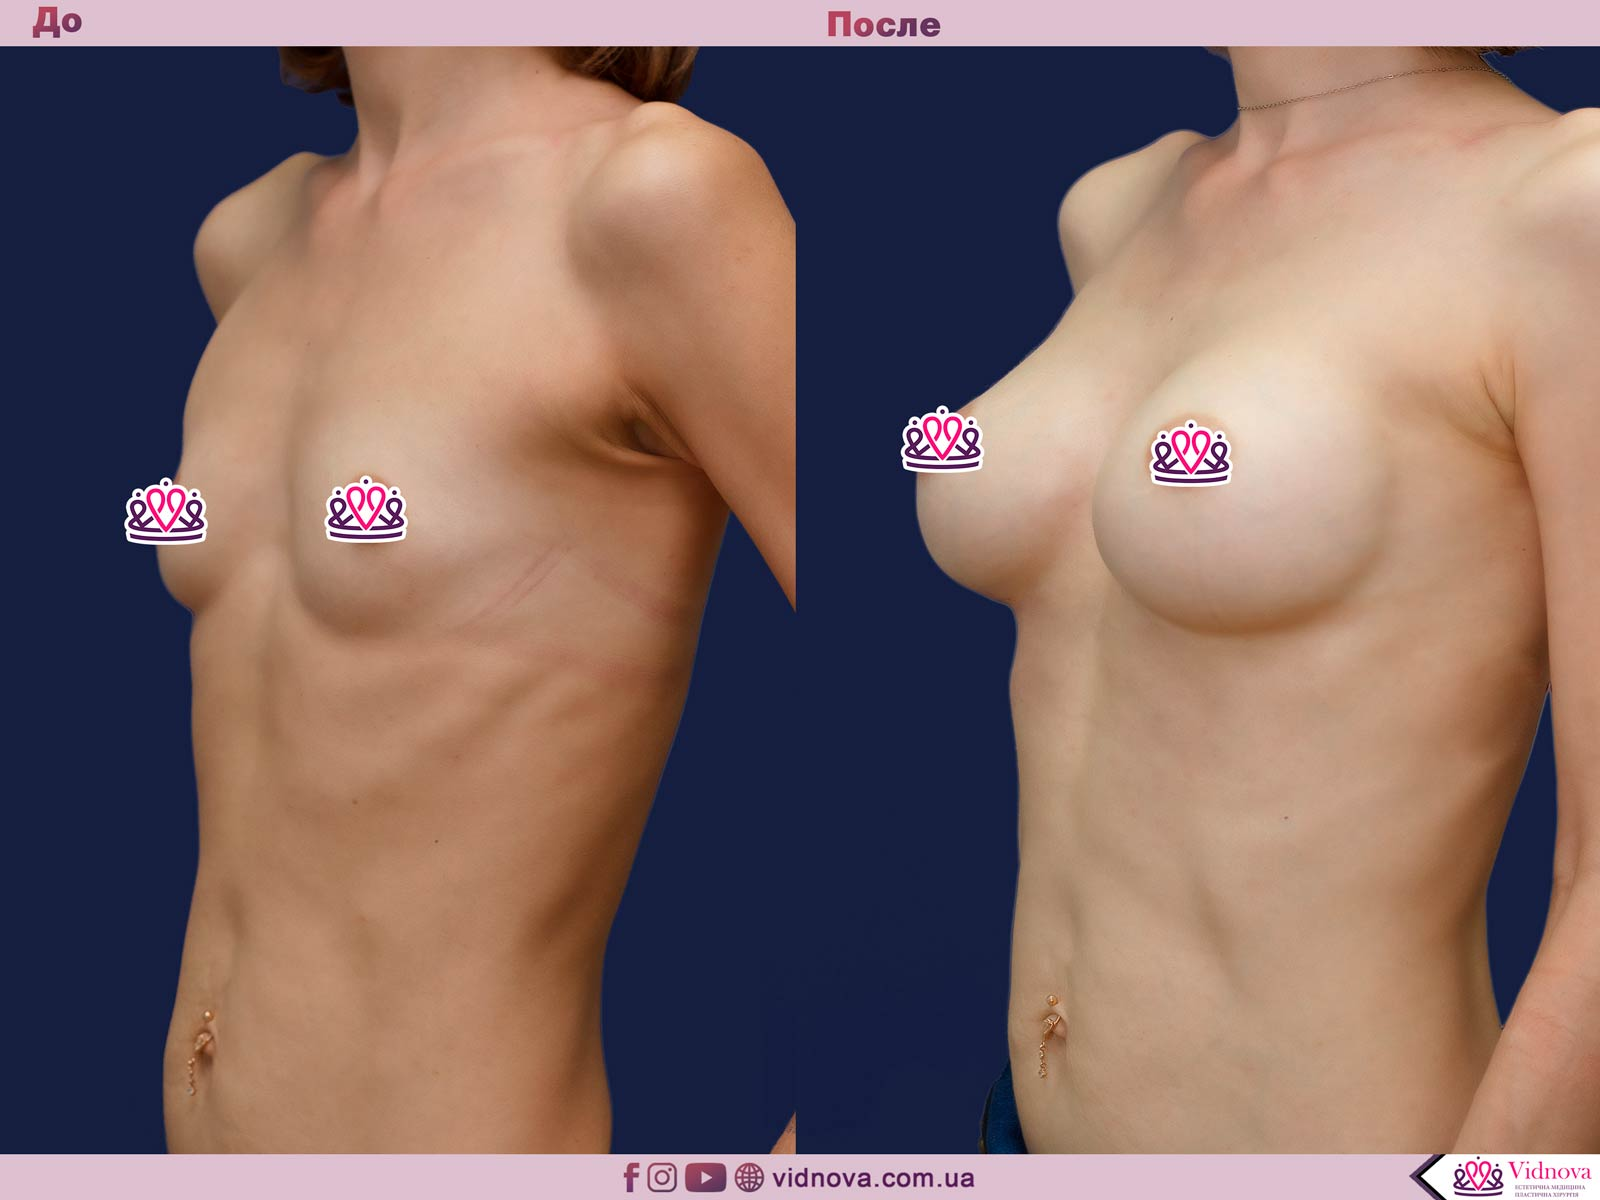 Увеличение груди: Фото ДО и ПОСЛЕ - Пример №65-2 - Клиника Vidnova